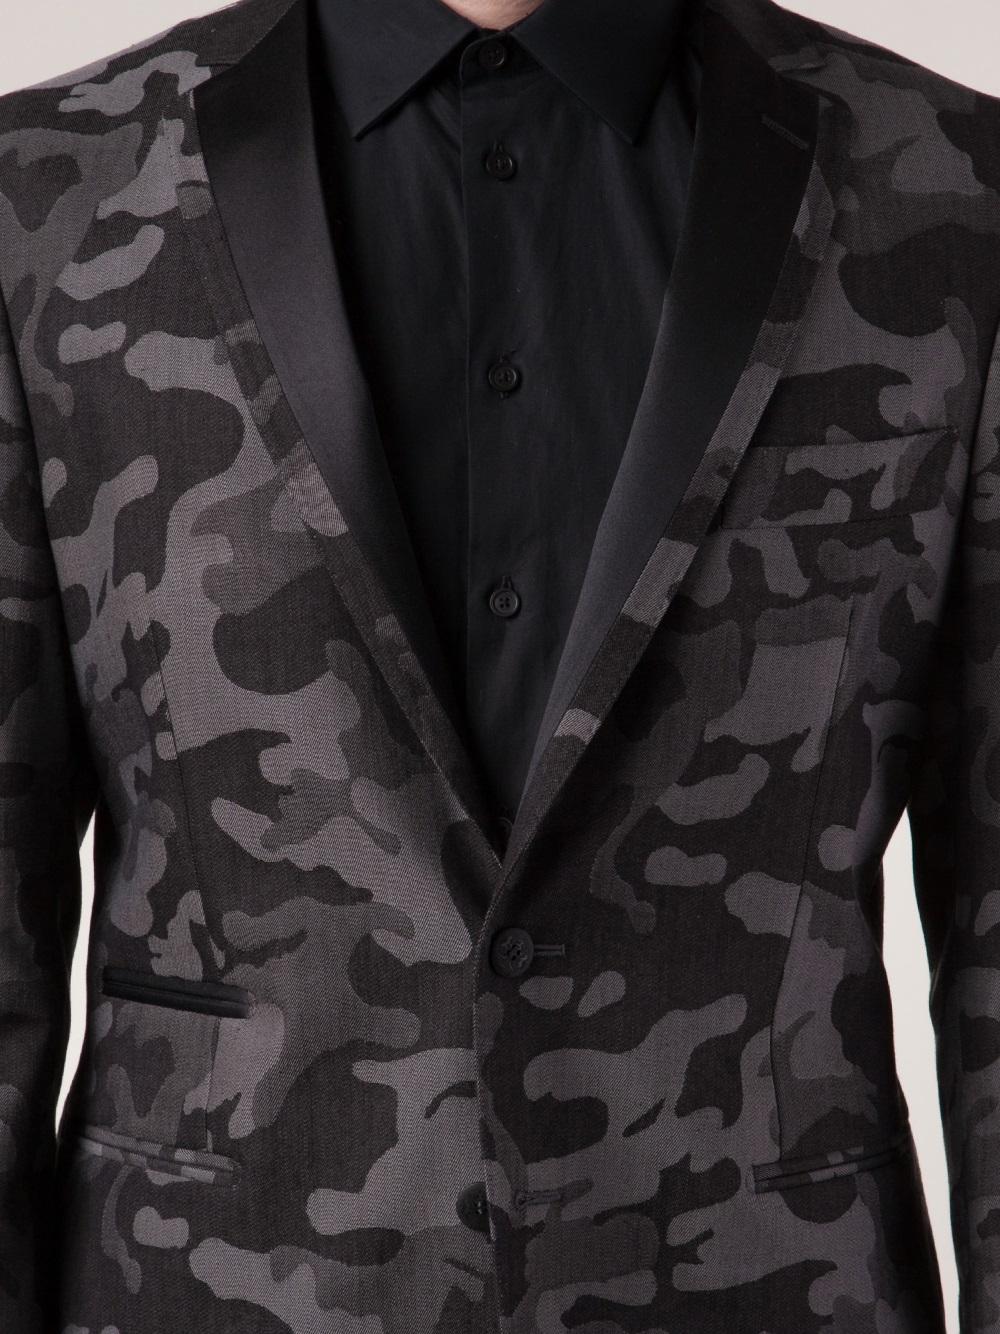 Tonello Camouflage Print Blazer In Gray For Men Lyst